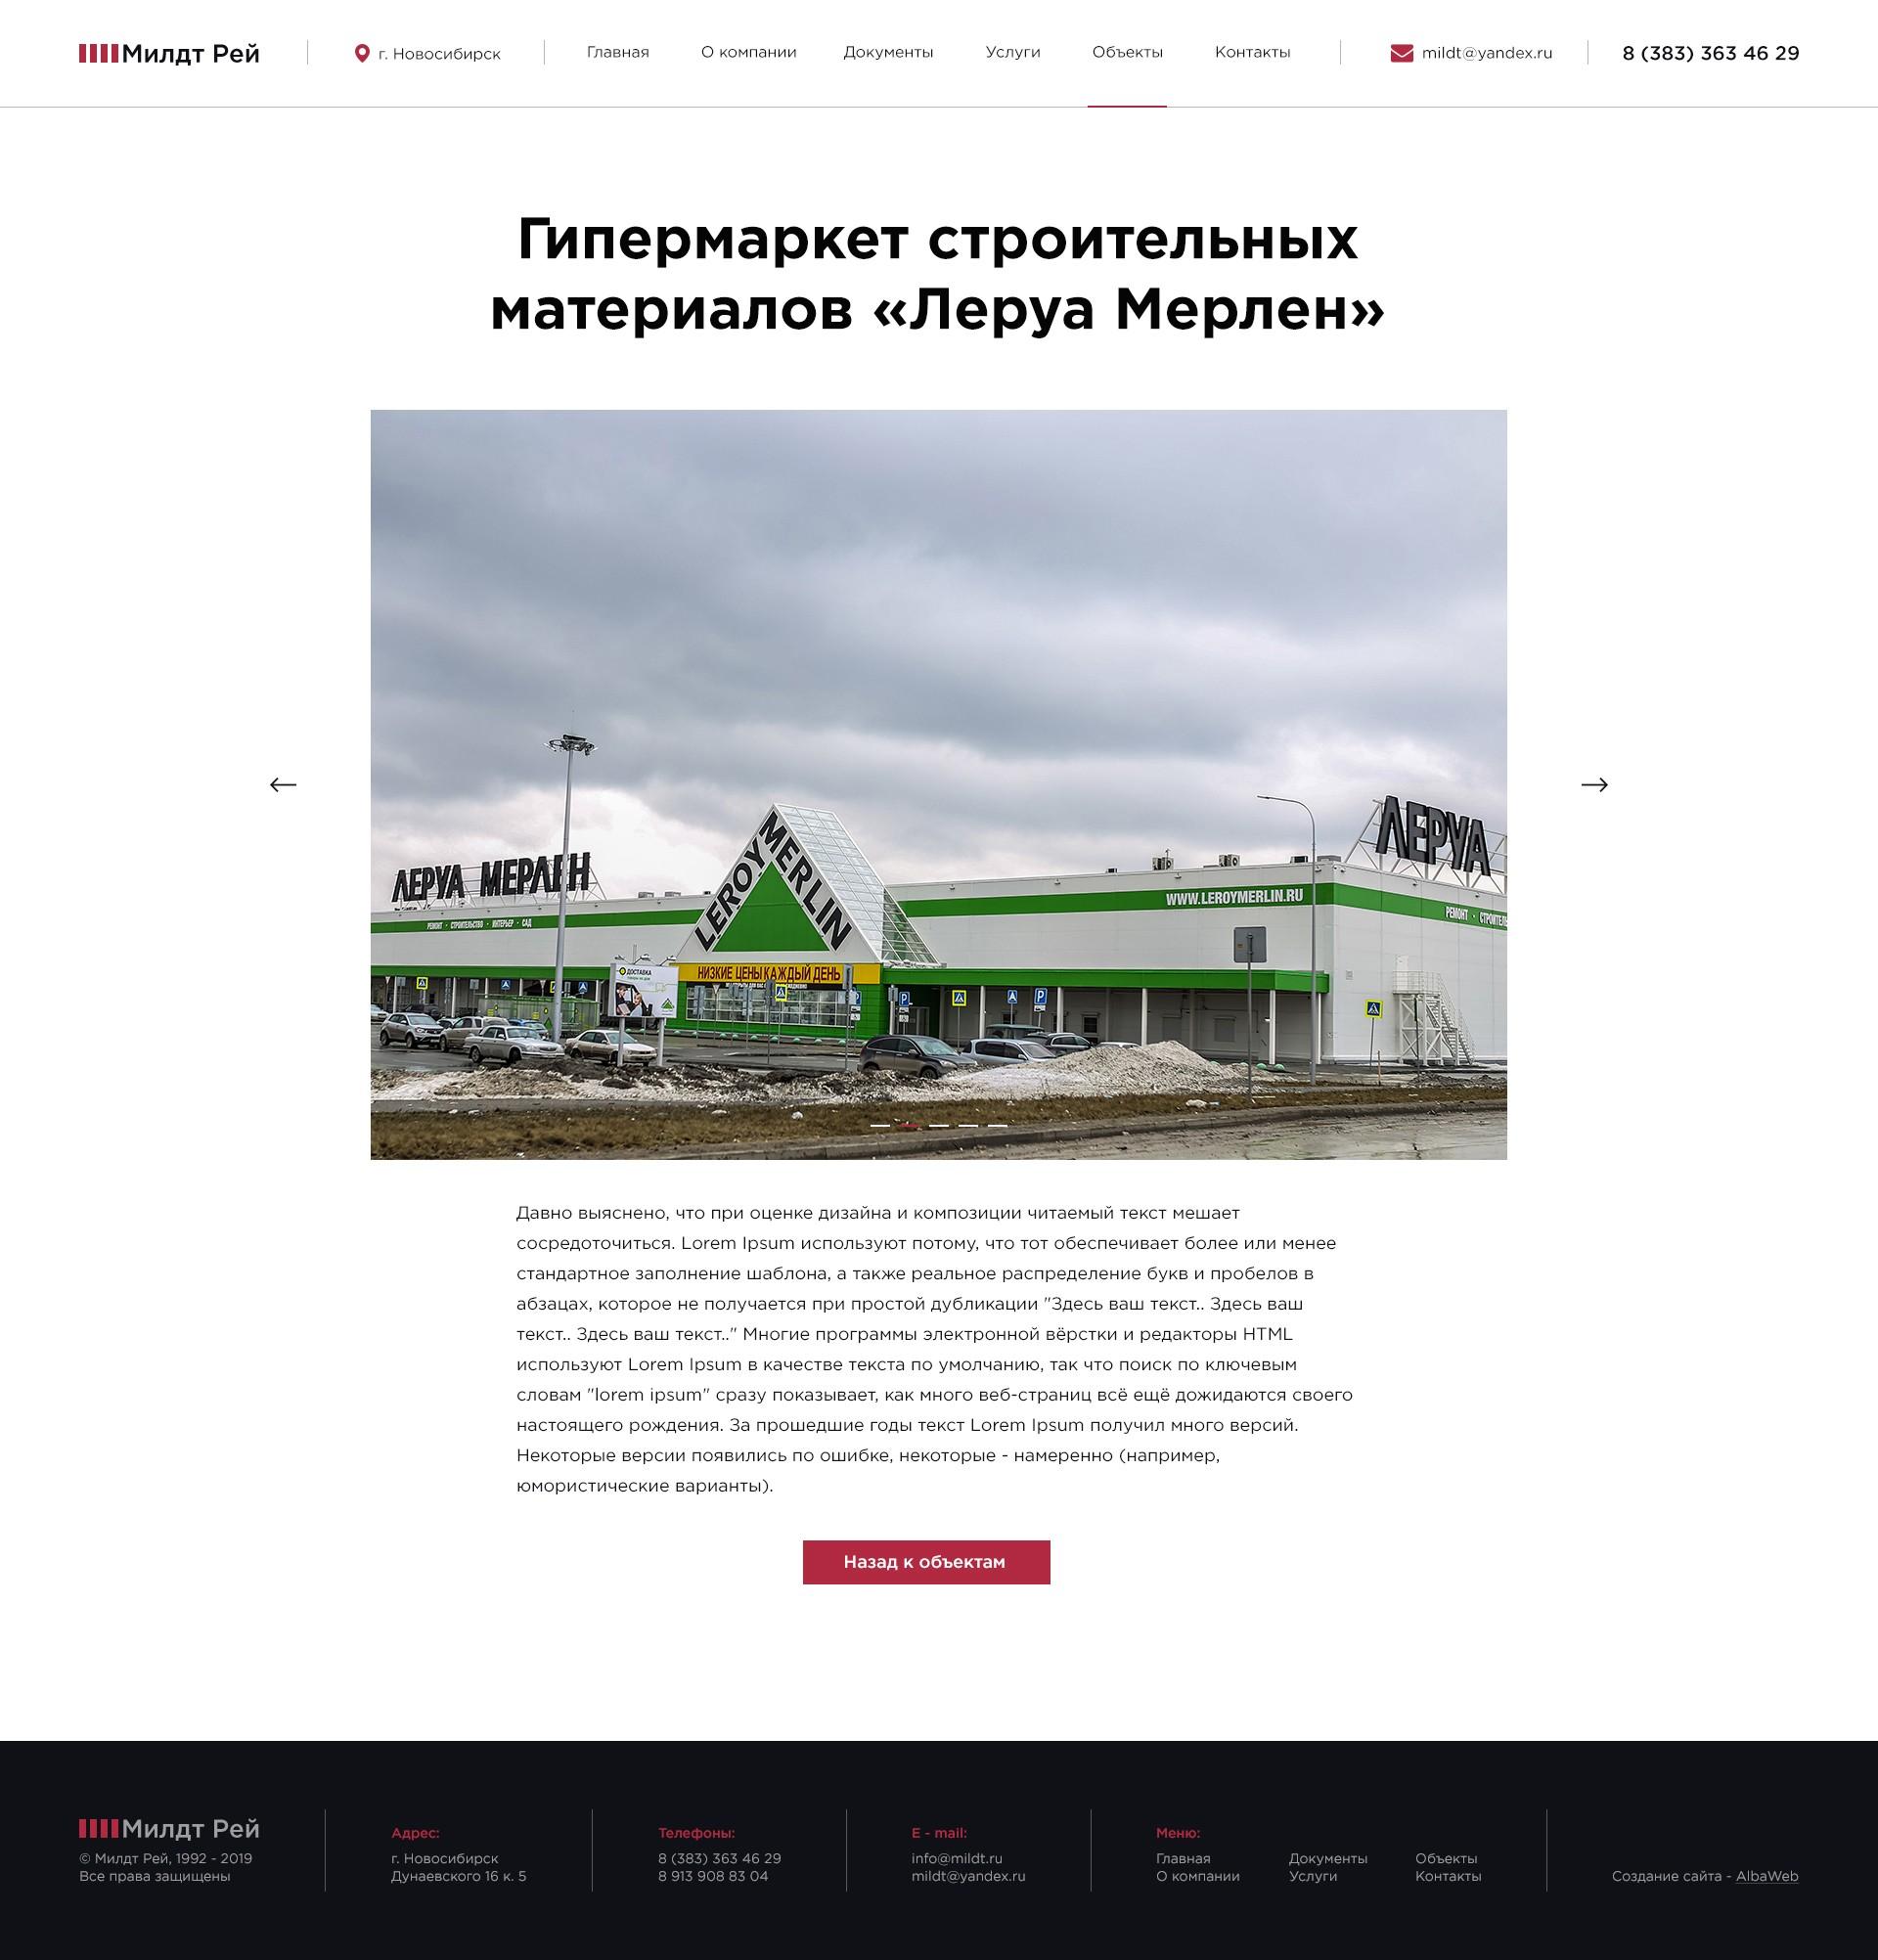 maket 1758px stranica obekta - Милдт Рей